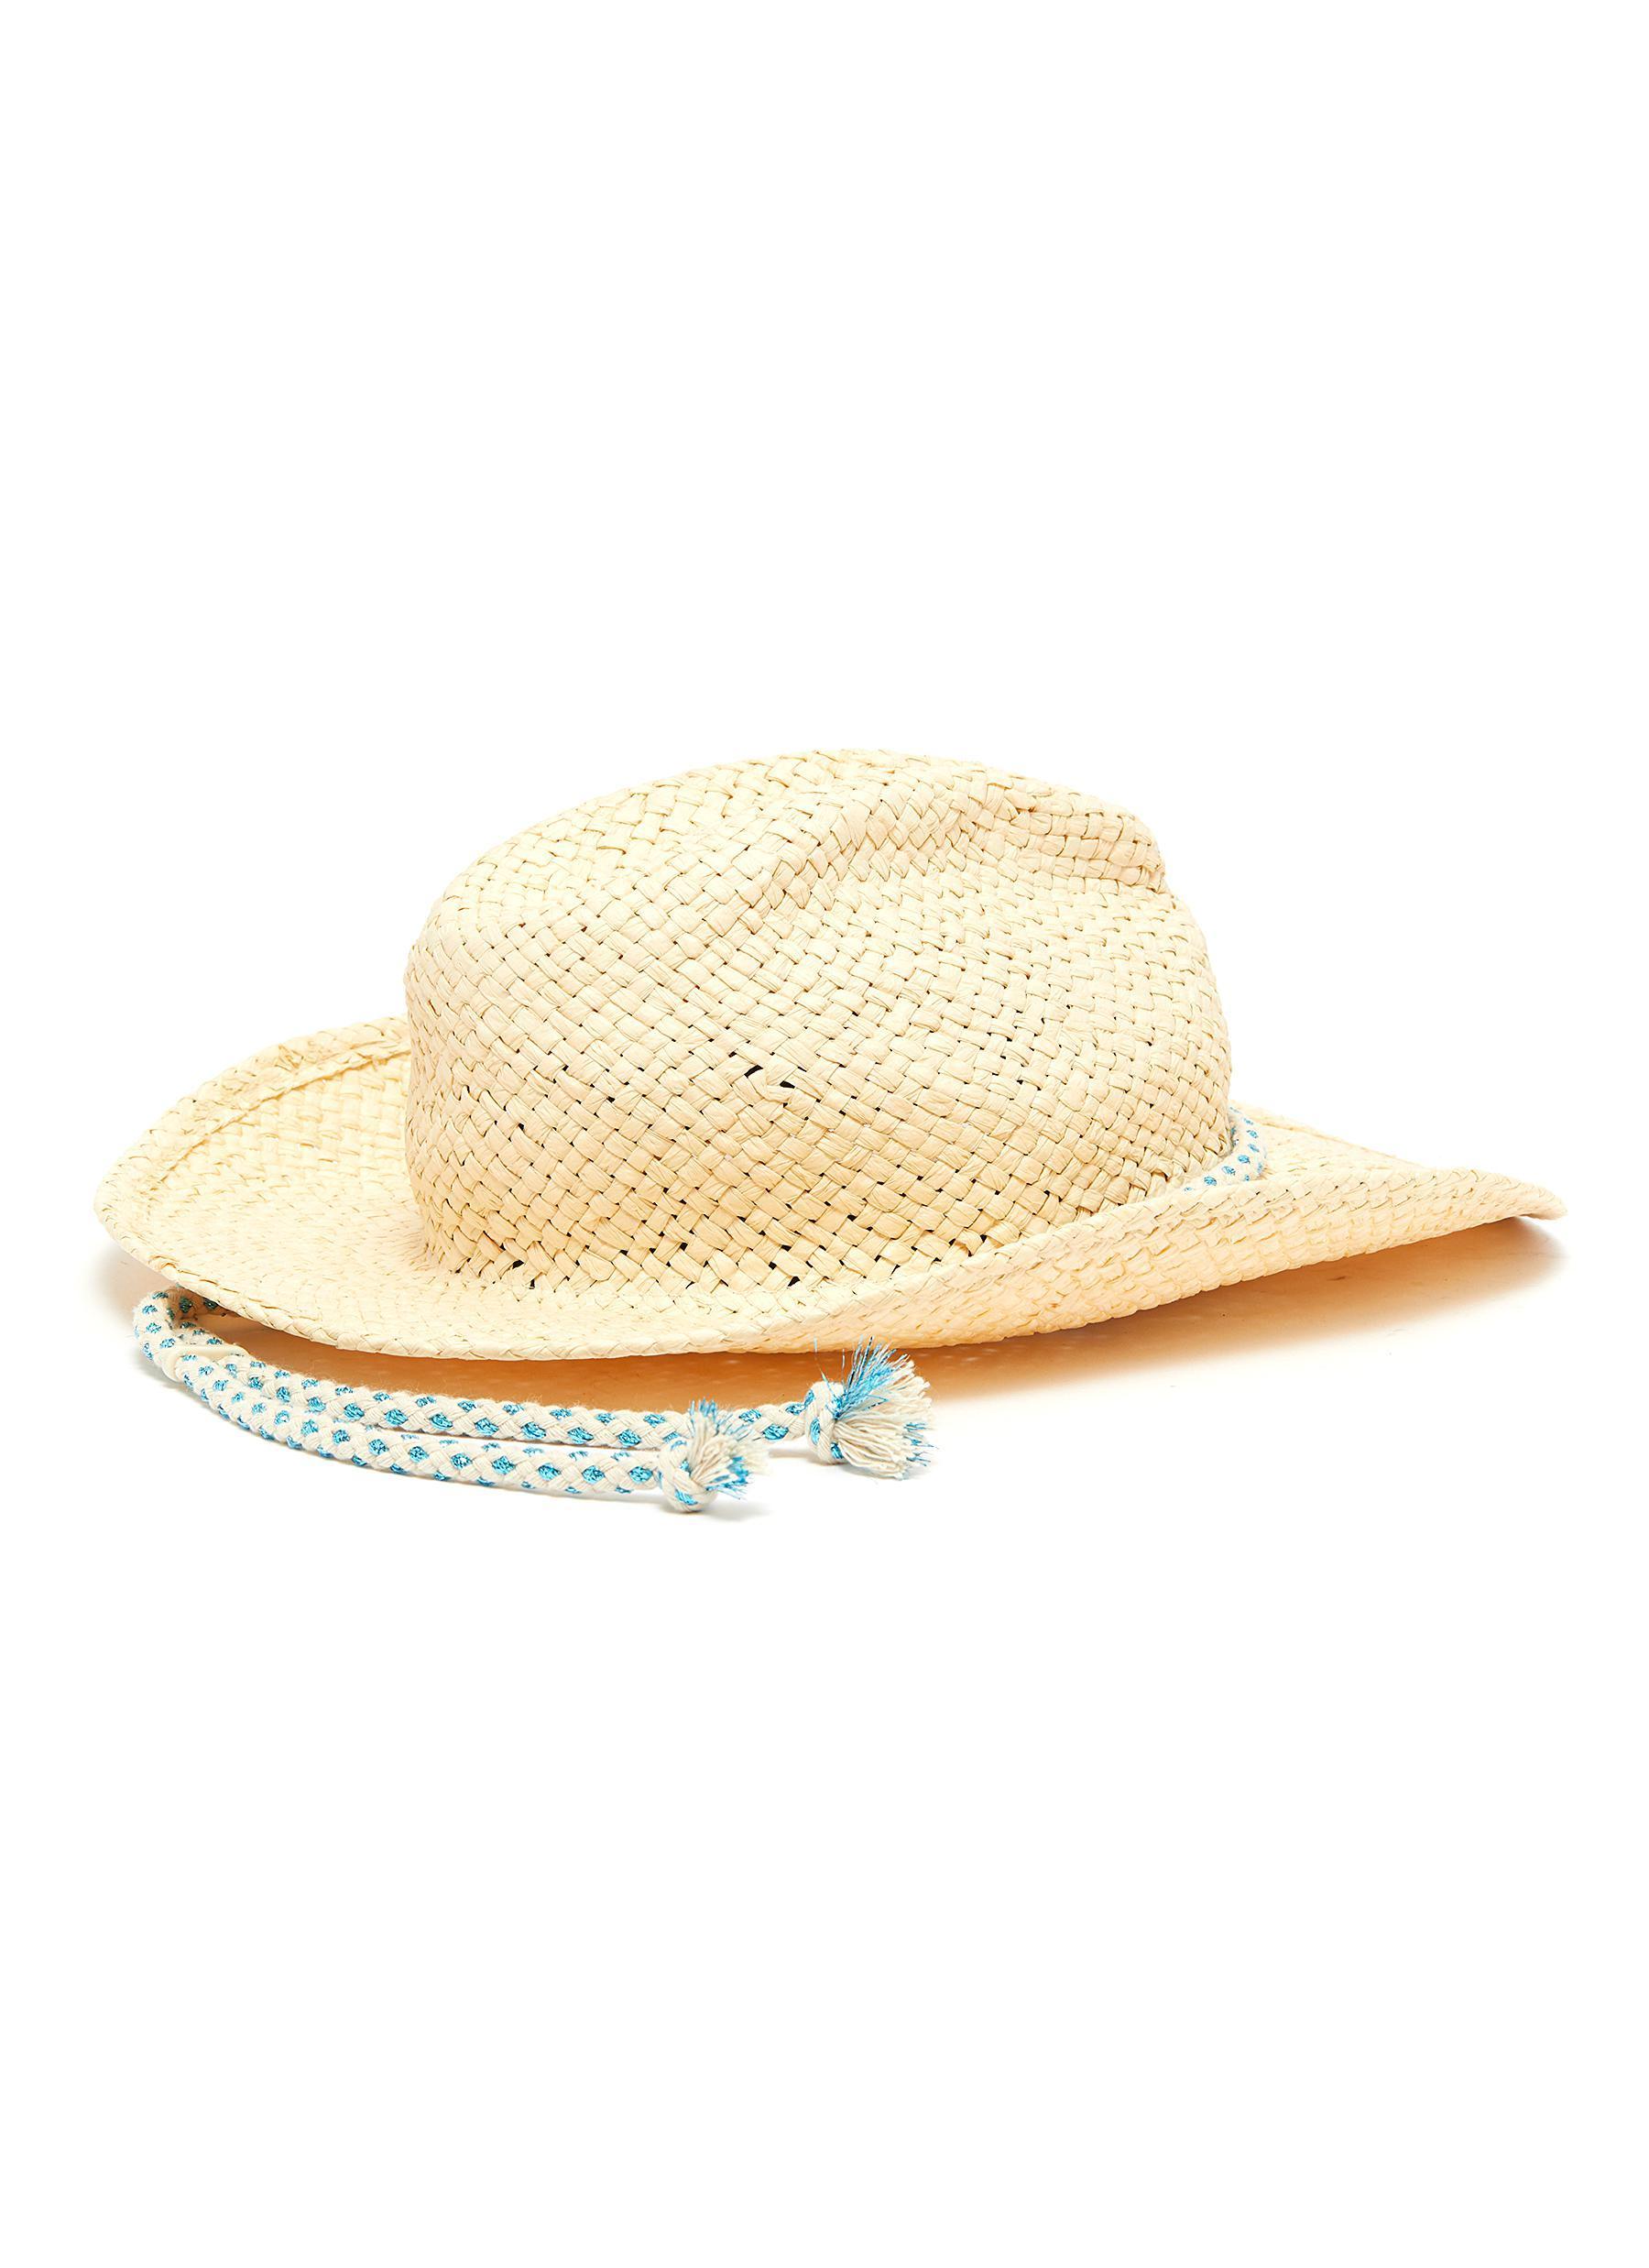 c10d2f55 Maison Michel 'austin' Rope Raffia Straw Cowboy Hat in Natural - Lyst